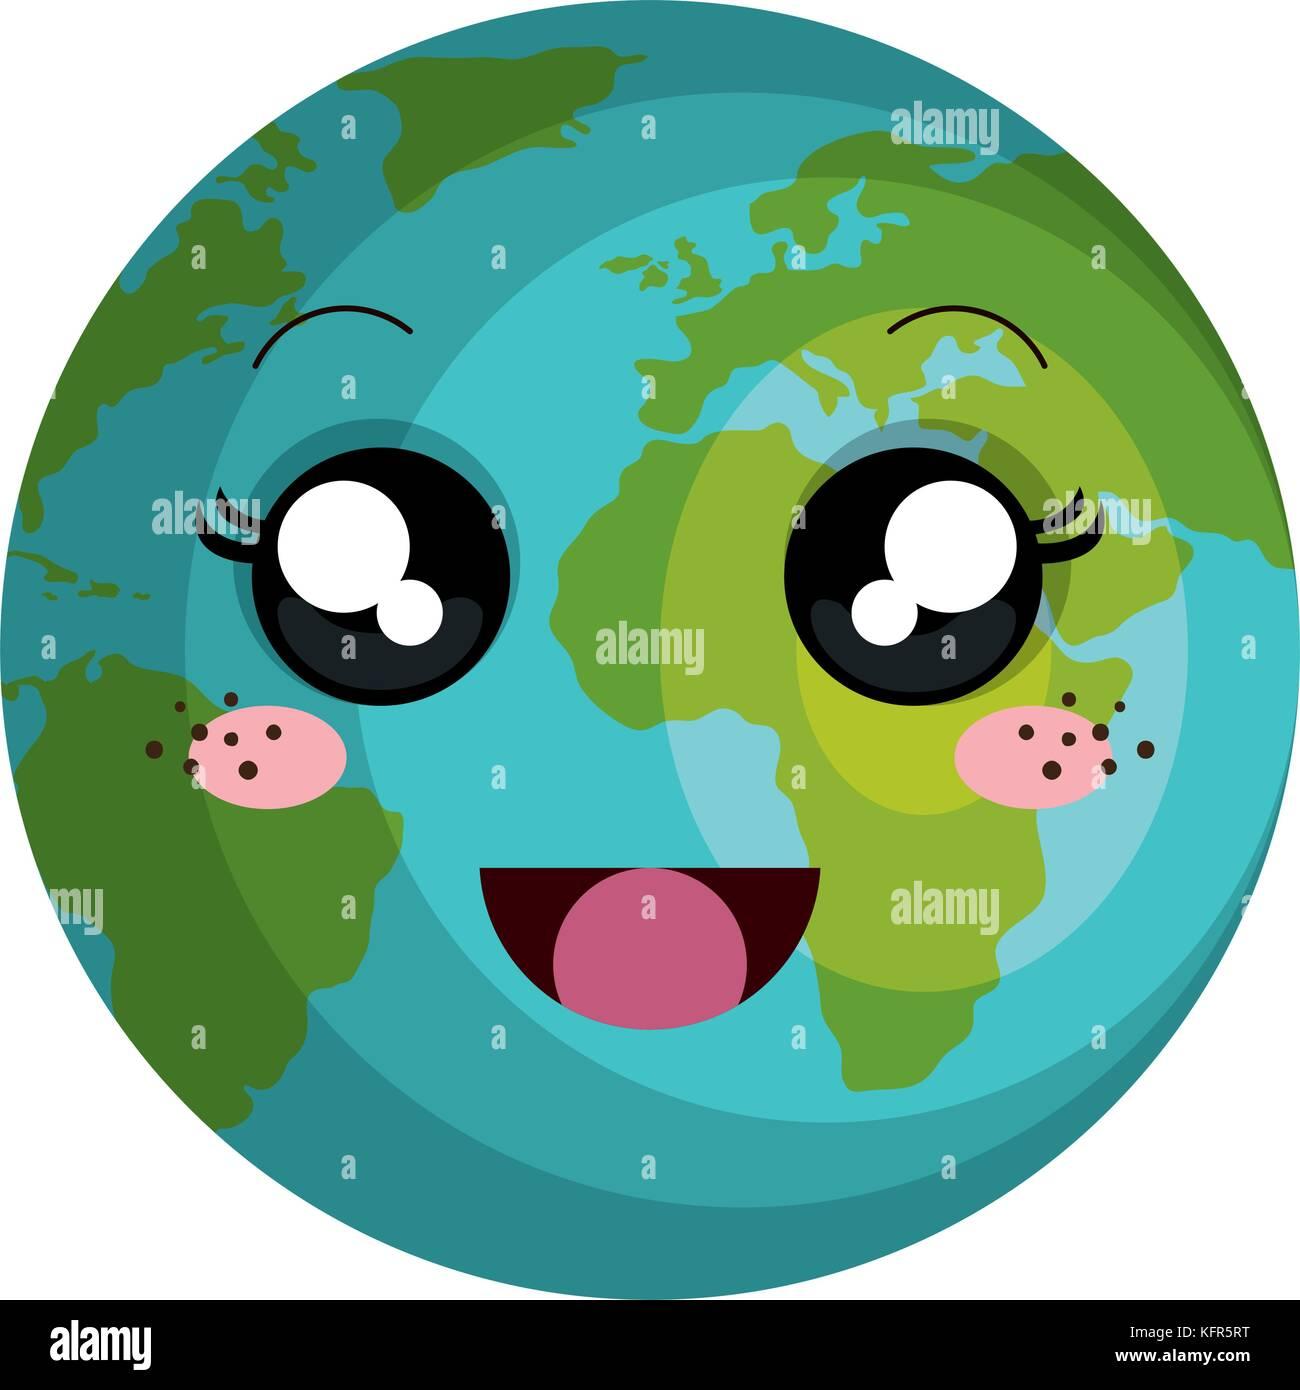 La Planète Terre Kawaii Character Vector Illustration Design